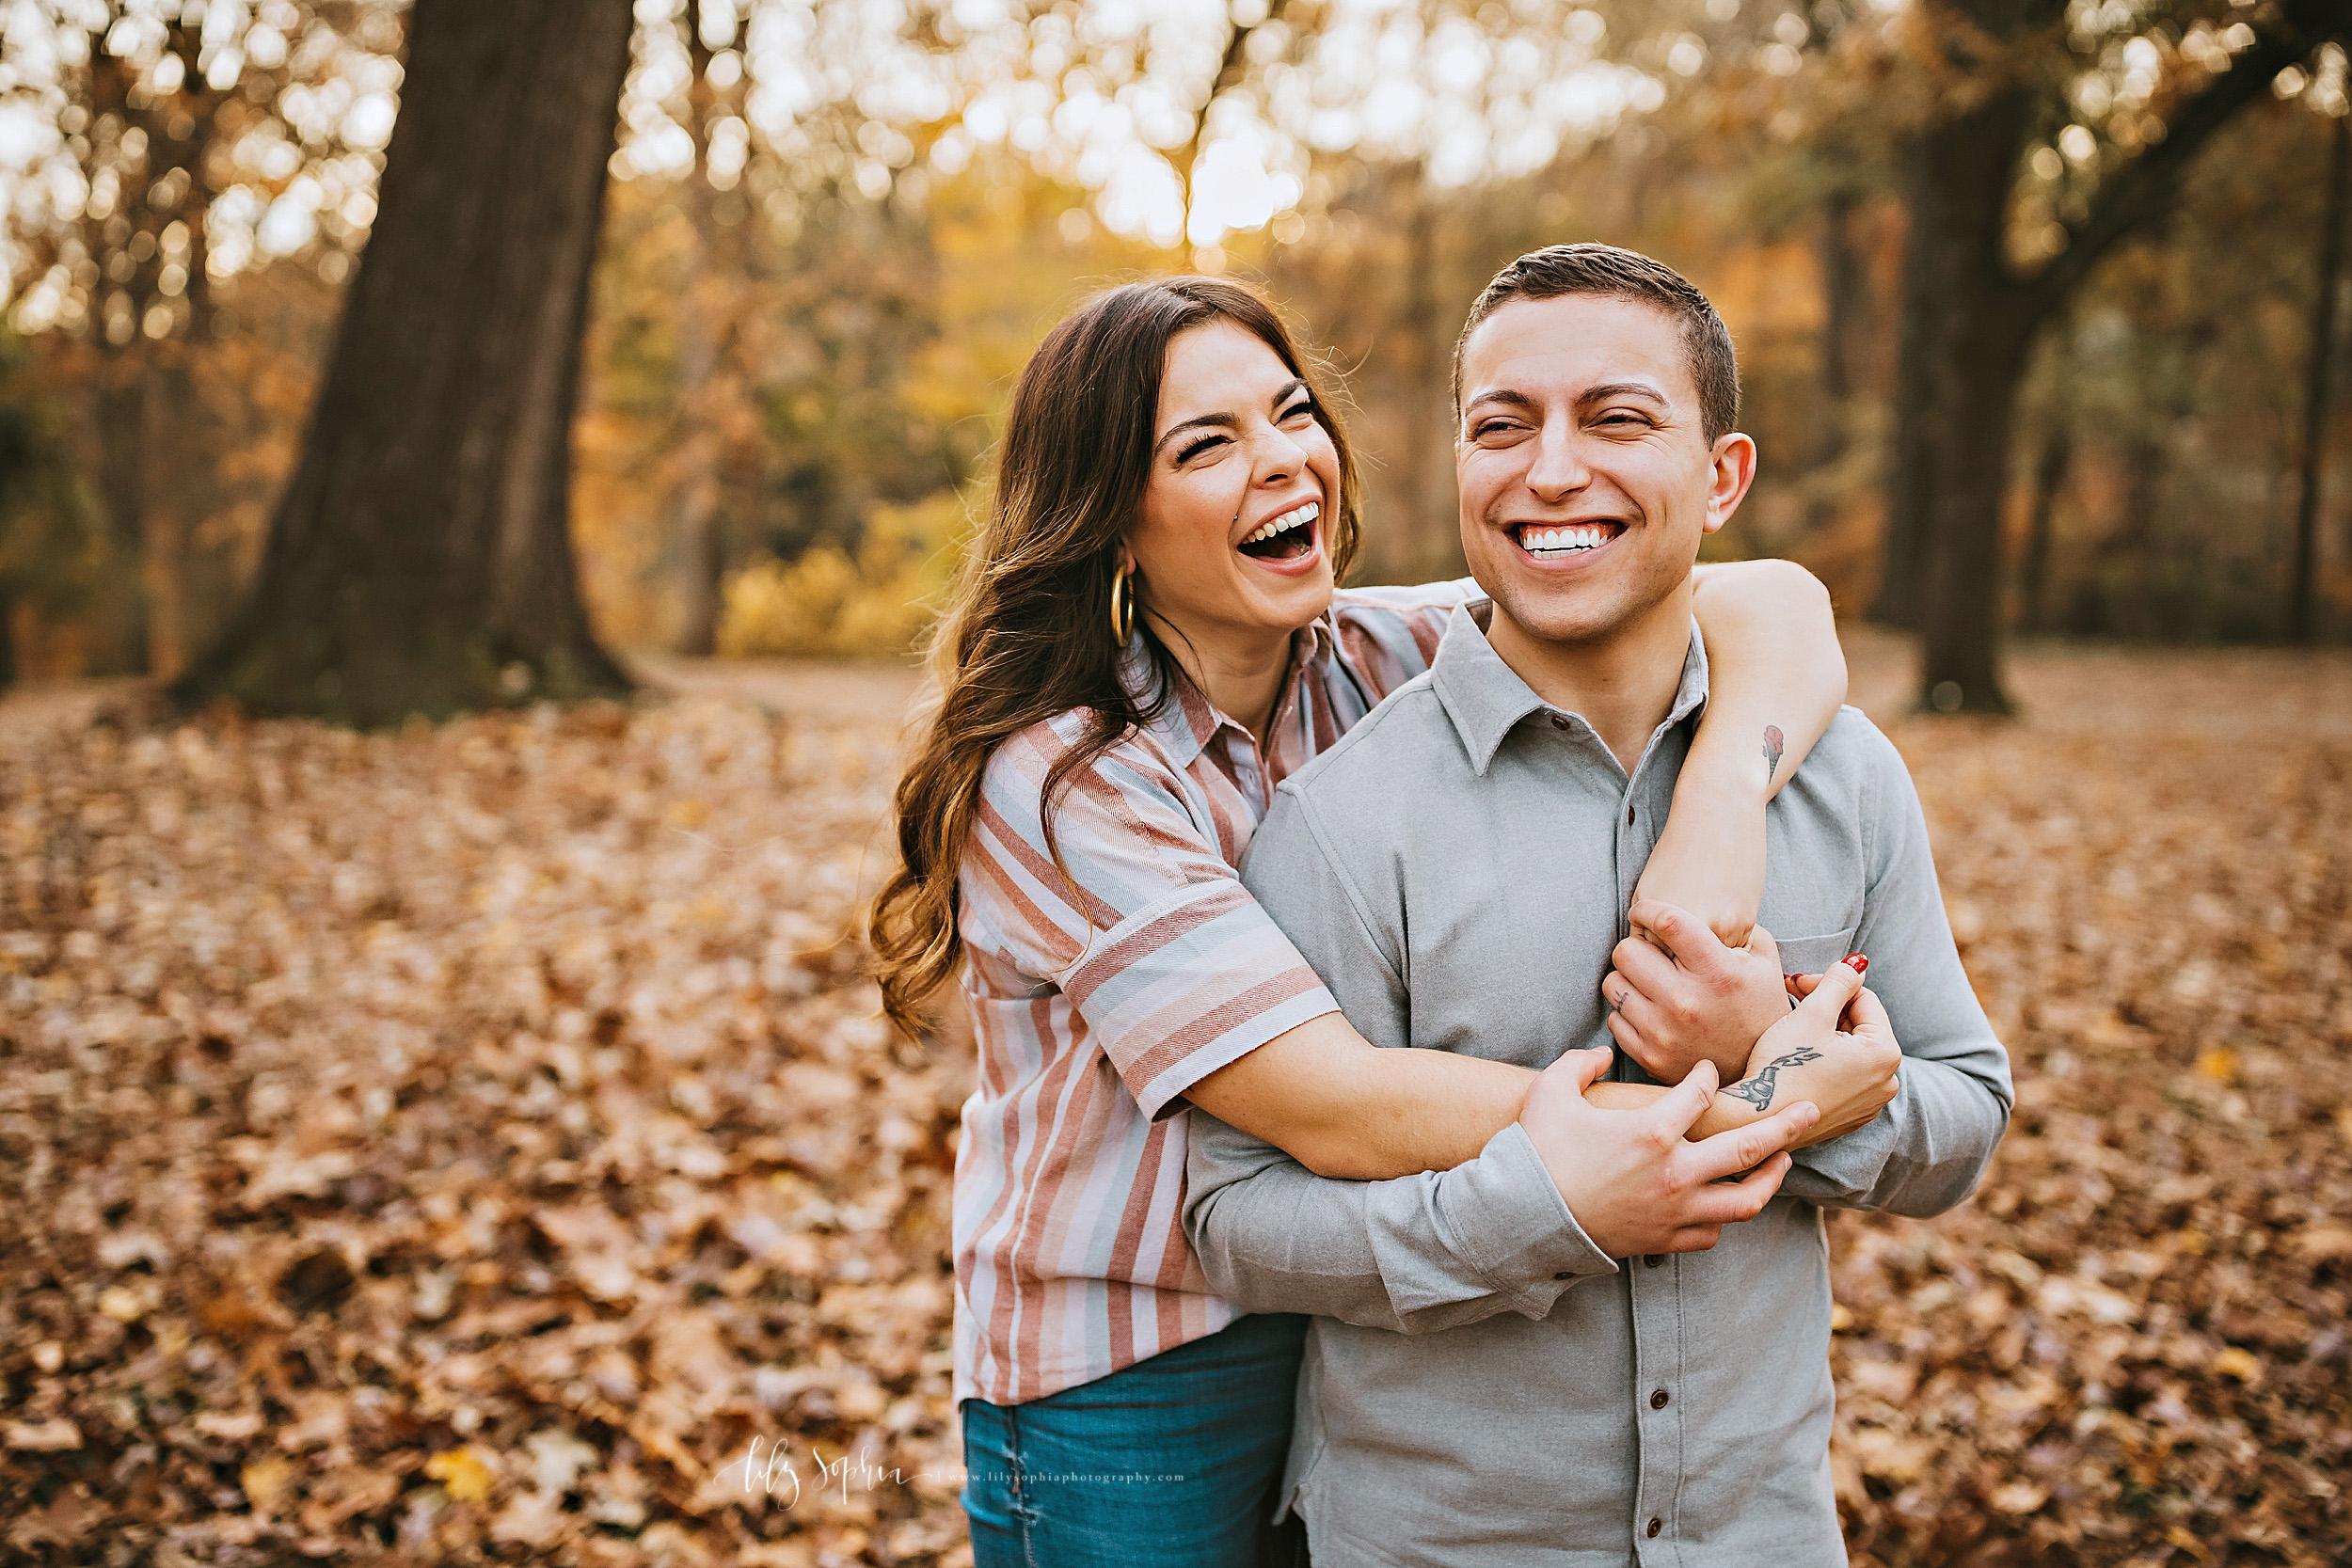 atlanta-reynoldstown-peoplestown-decatur-sandy-springs-buckhead-virginia-highlands-west-end-decatur-lily-sophia-photography-outdoor-fall-couples-photos_1486.jpg